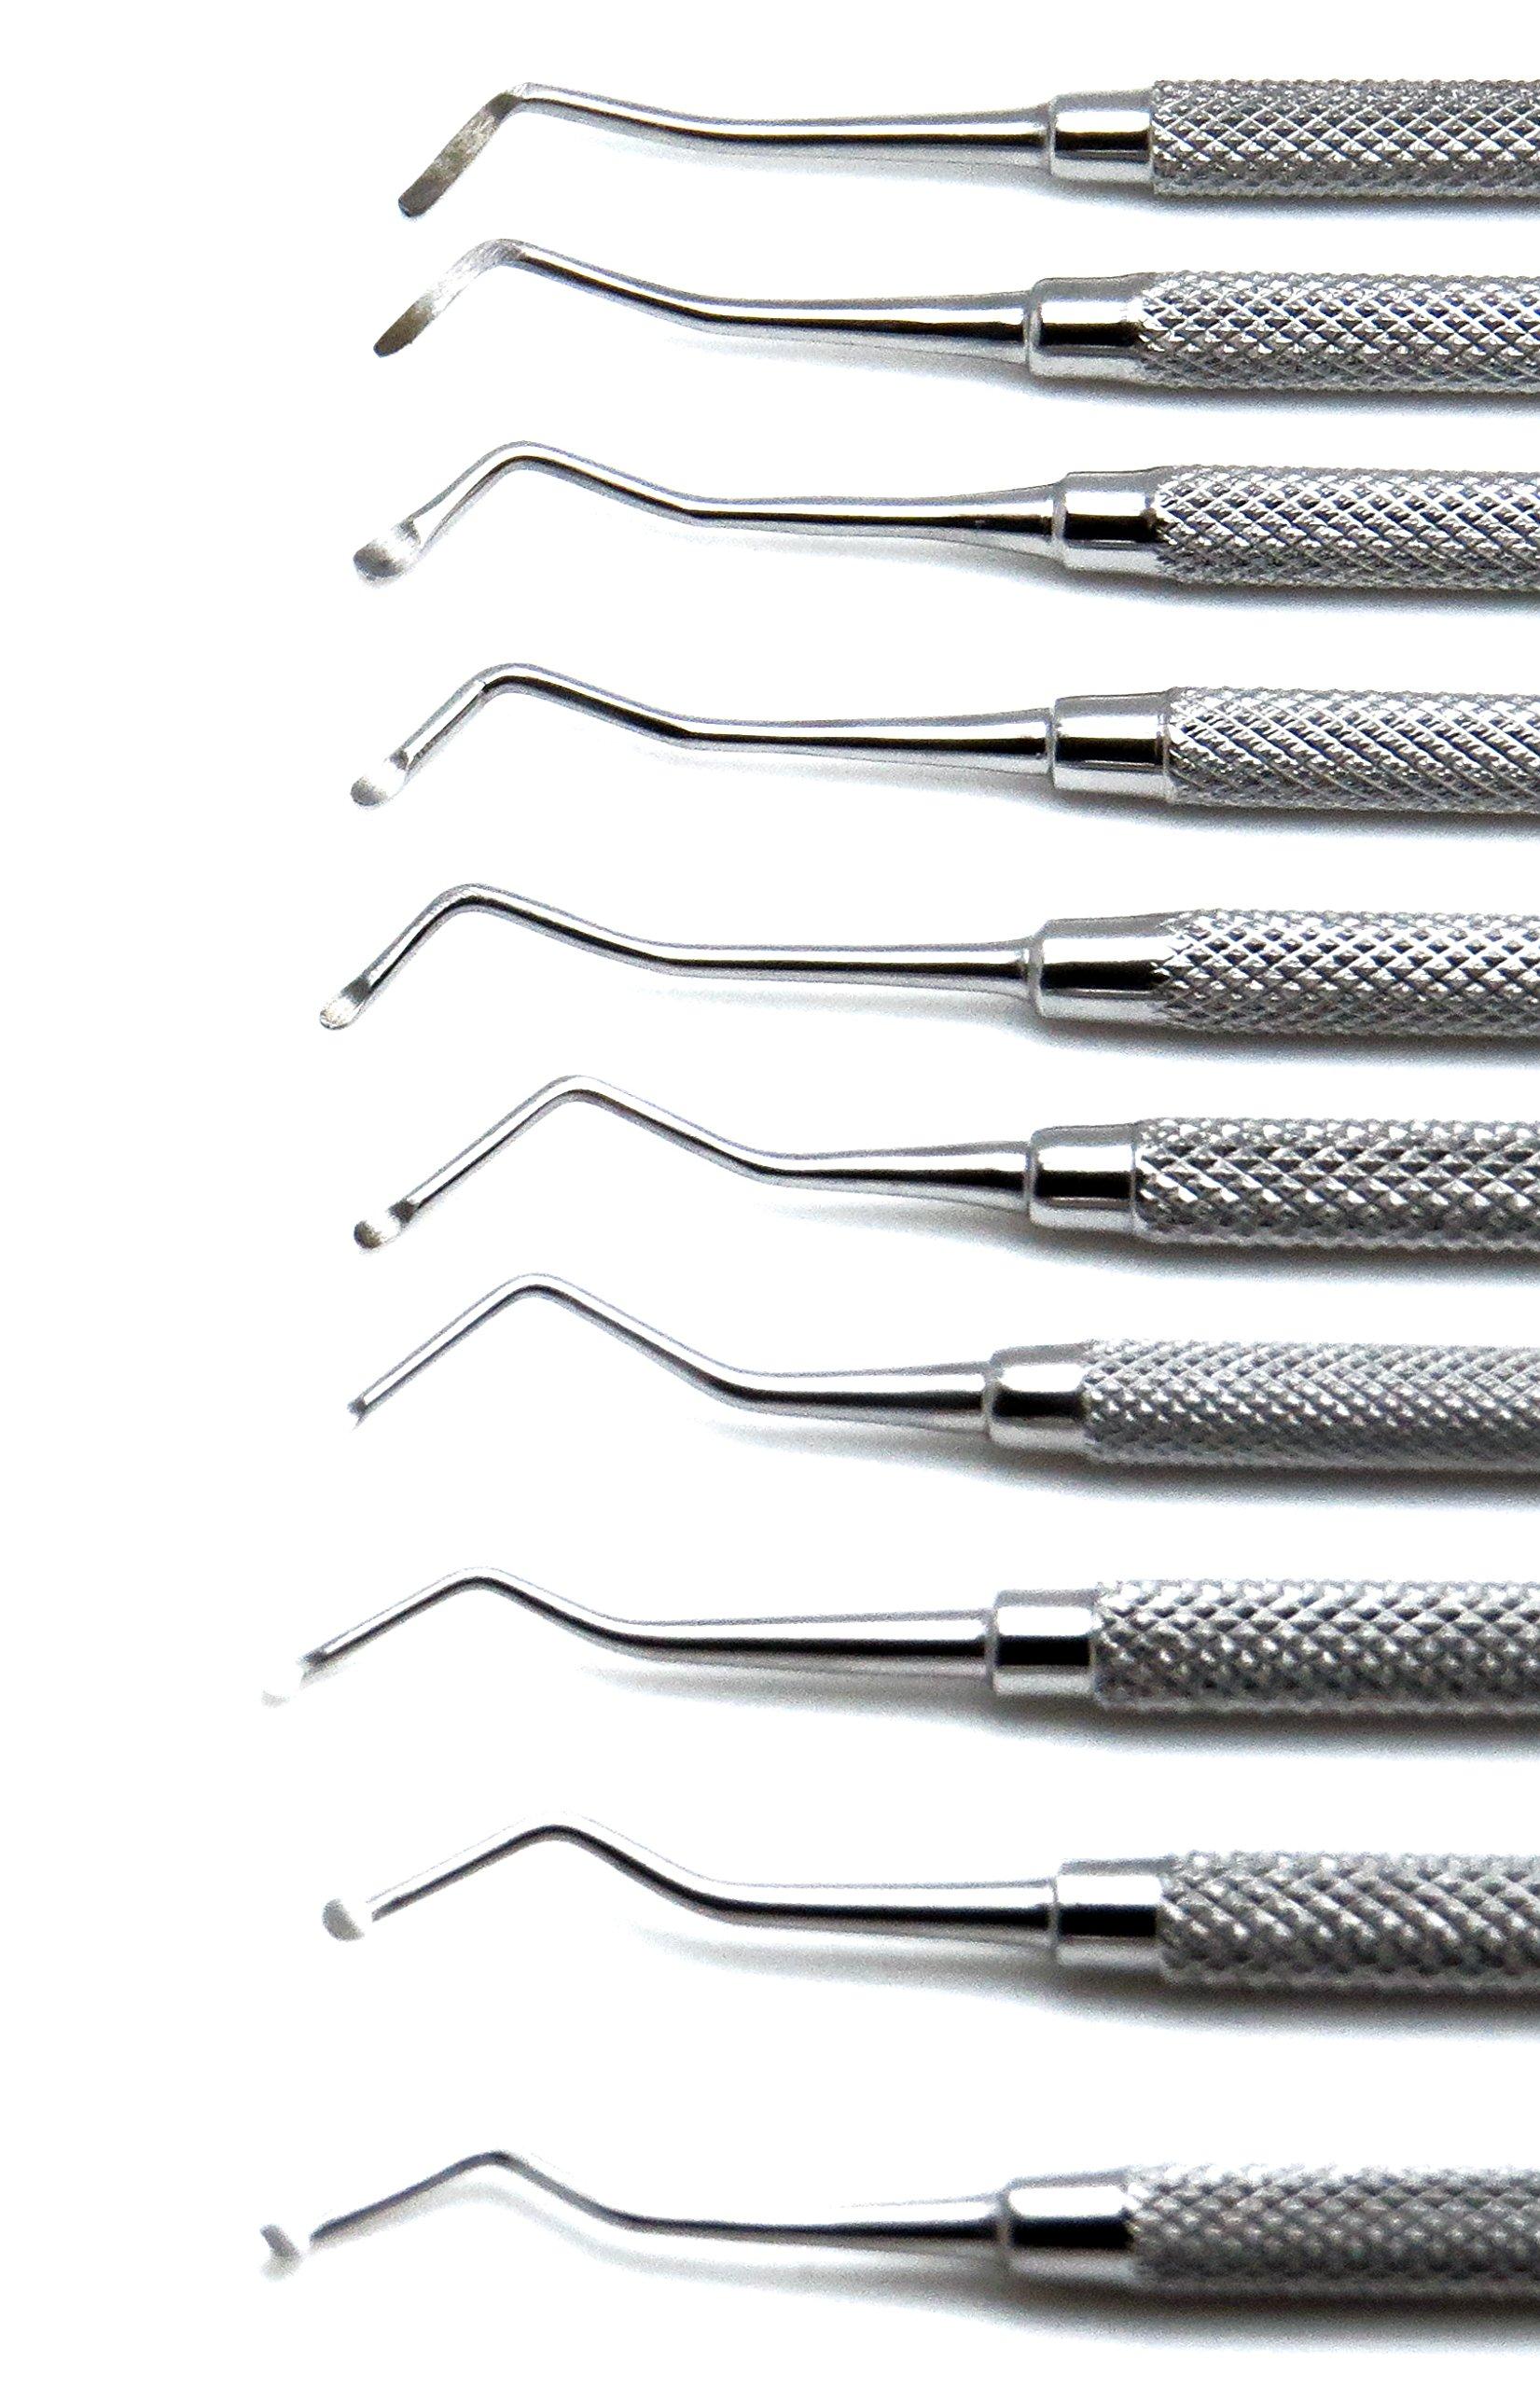 10 Pcs Dental Superior Excavator Spoon Ends 1mm-2.5mm Restorative Instrument by Superior (Image #3)